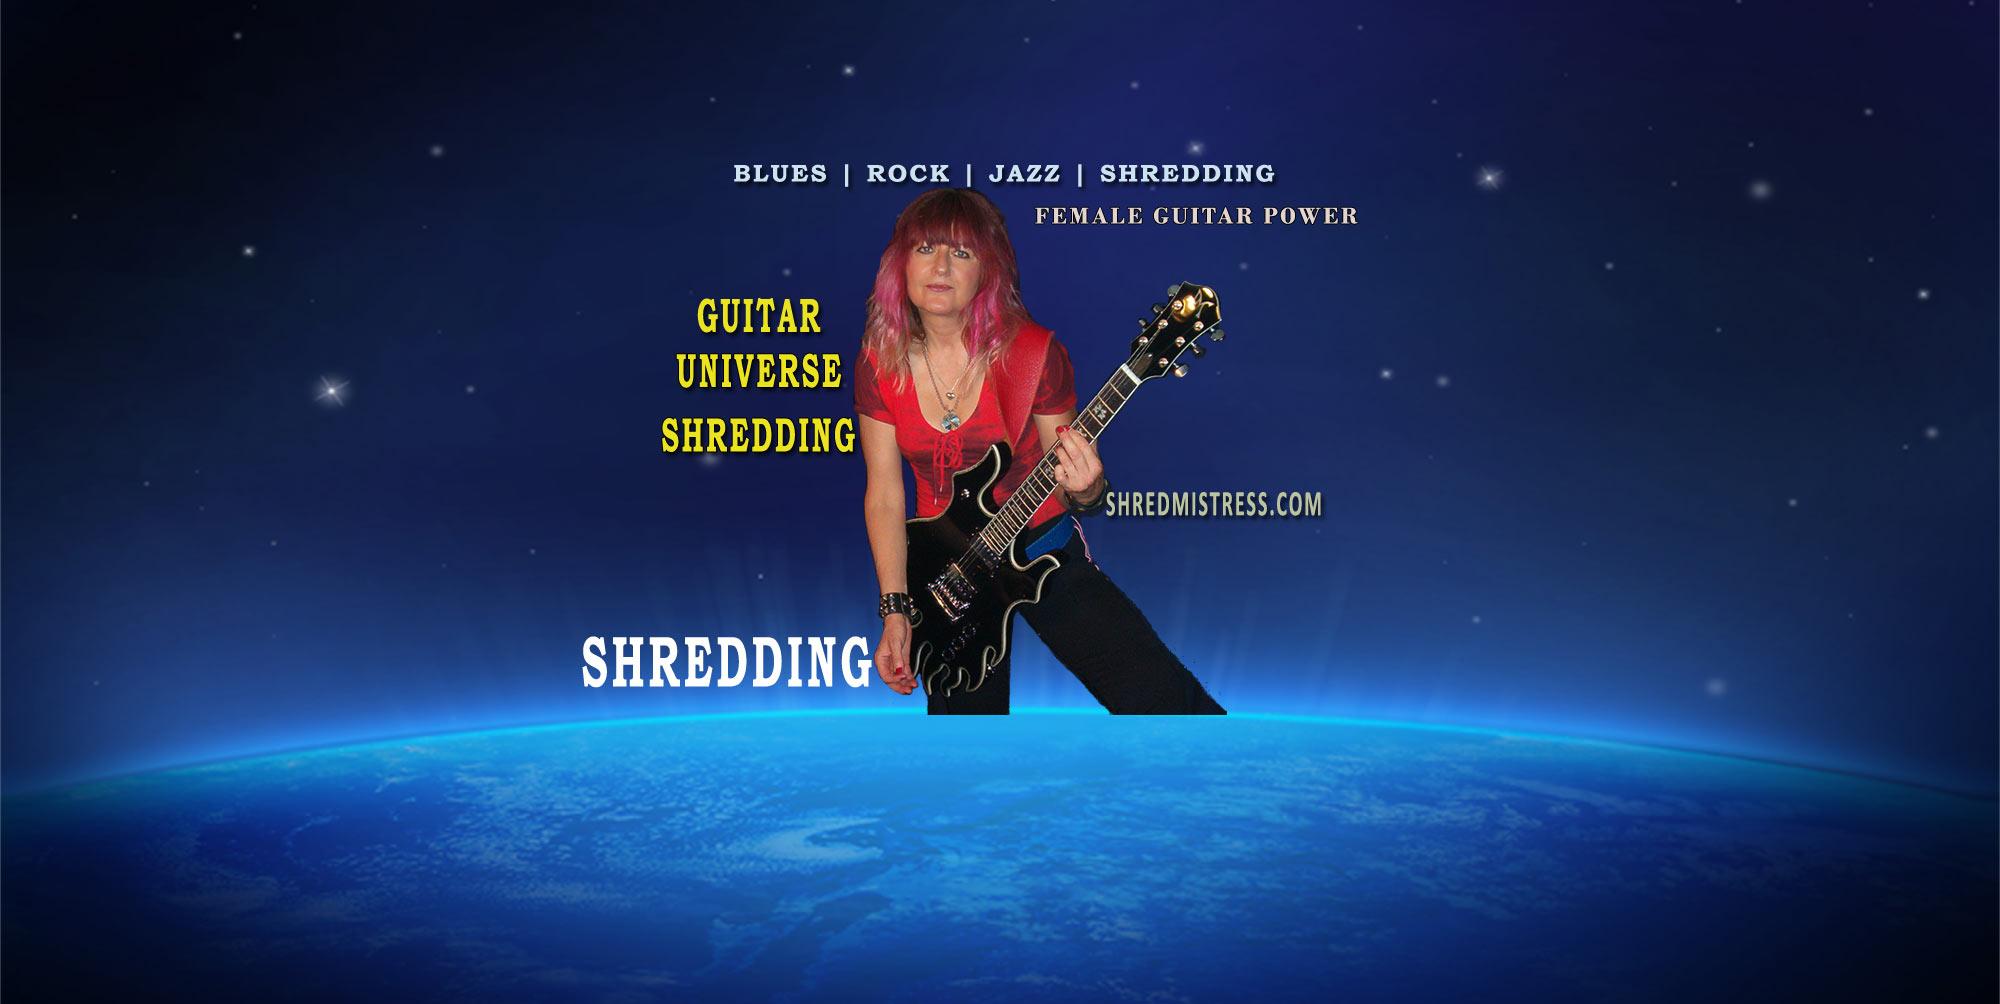 Female Guitarist and Guitar Teacher Shredmistress Rynata